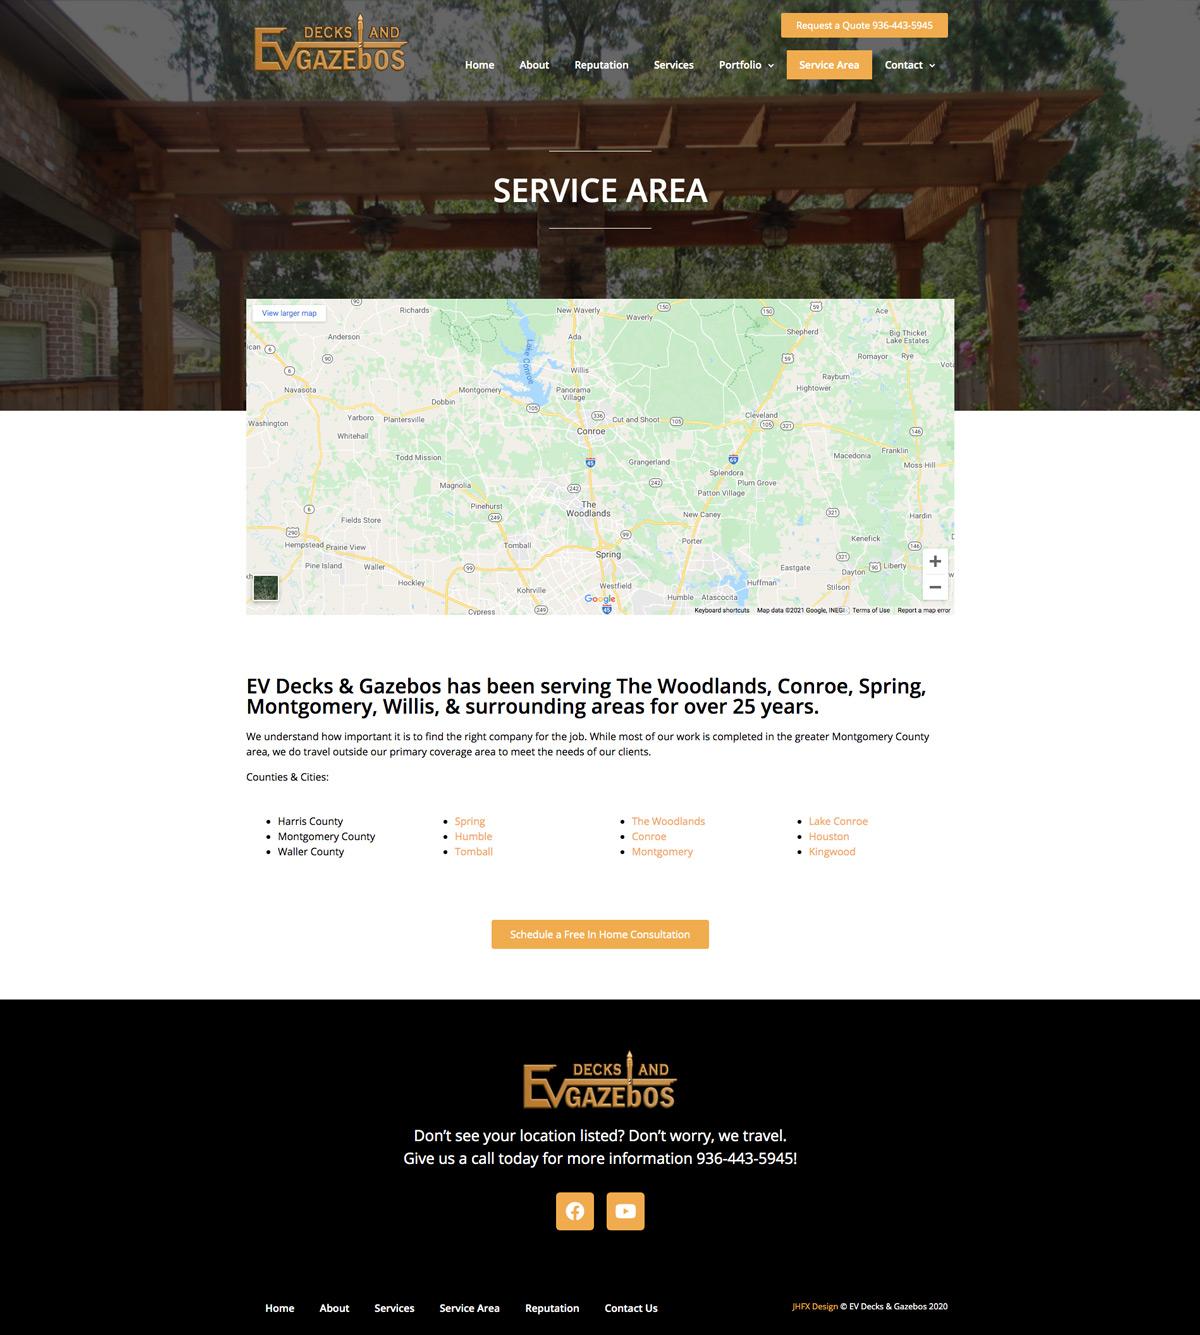 construction-website-design-the-woodlands-5